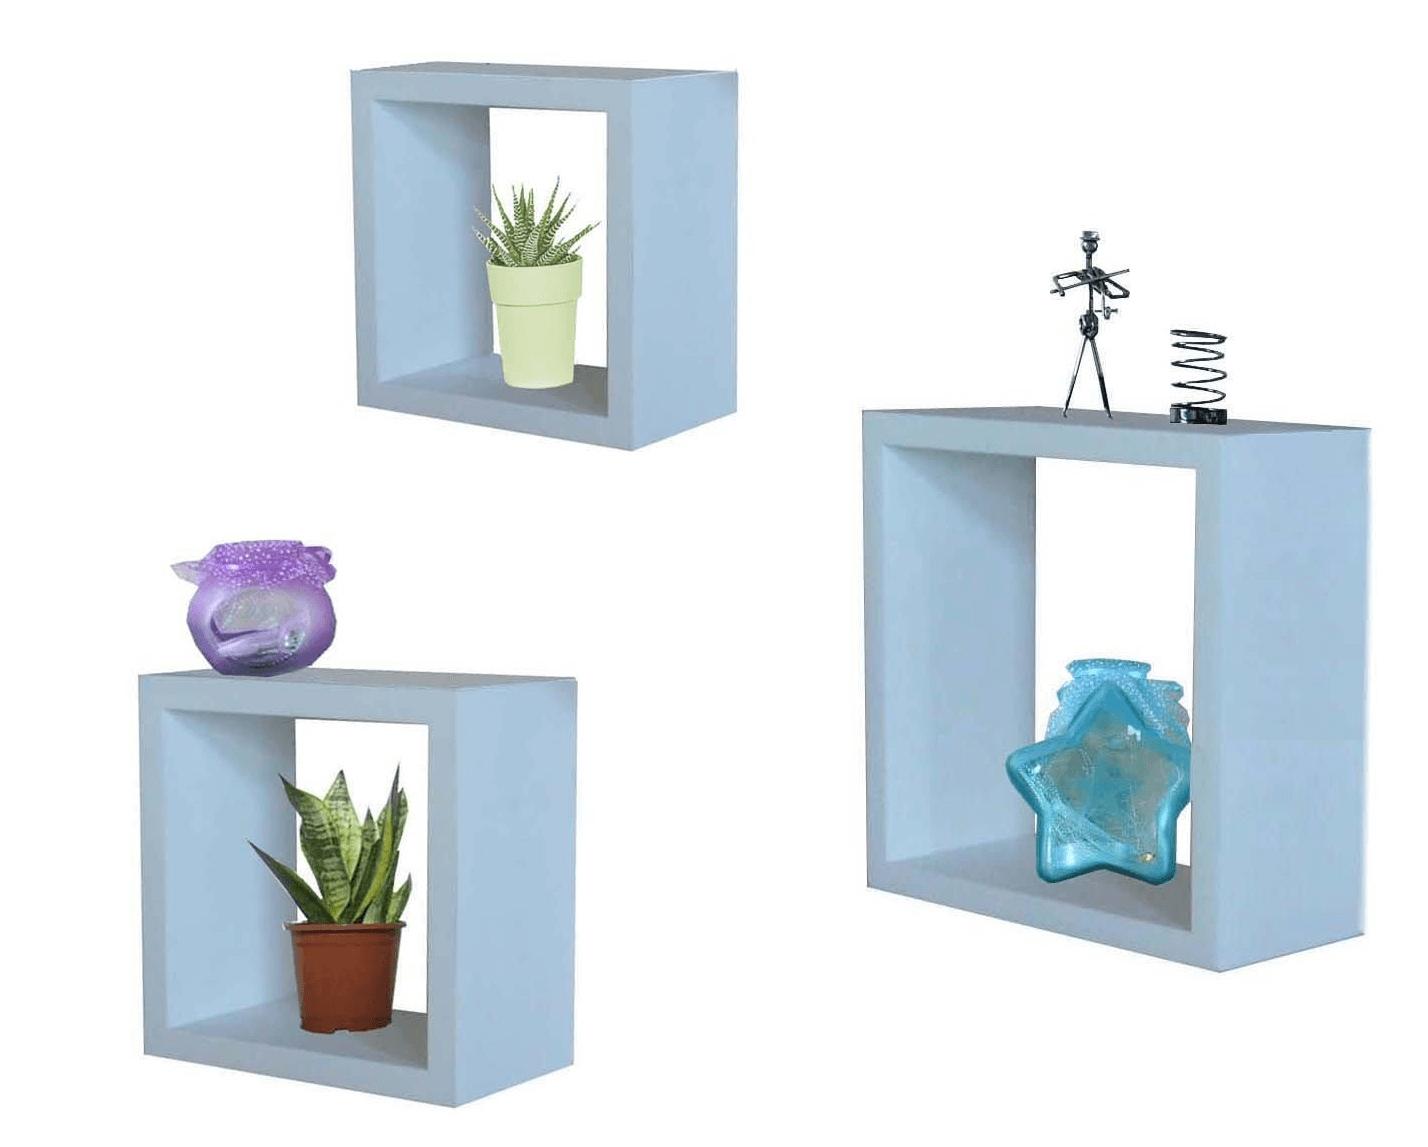 Cube shelf decor ideas